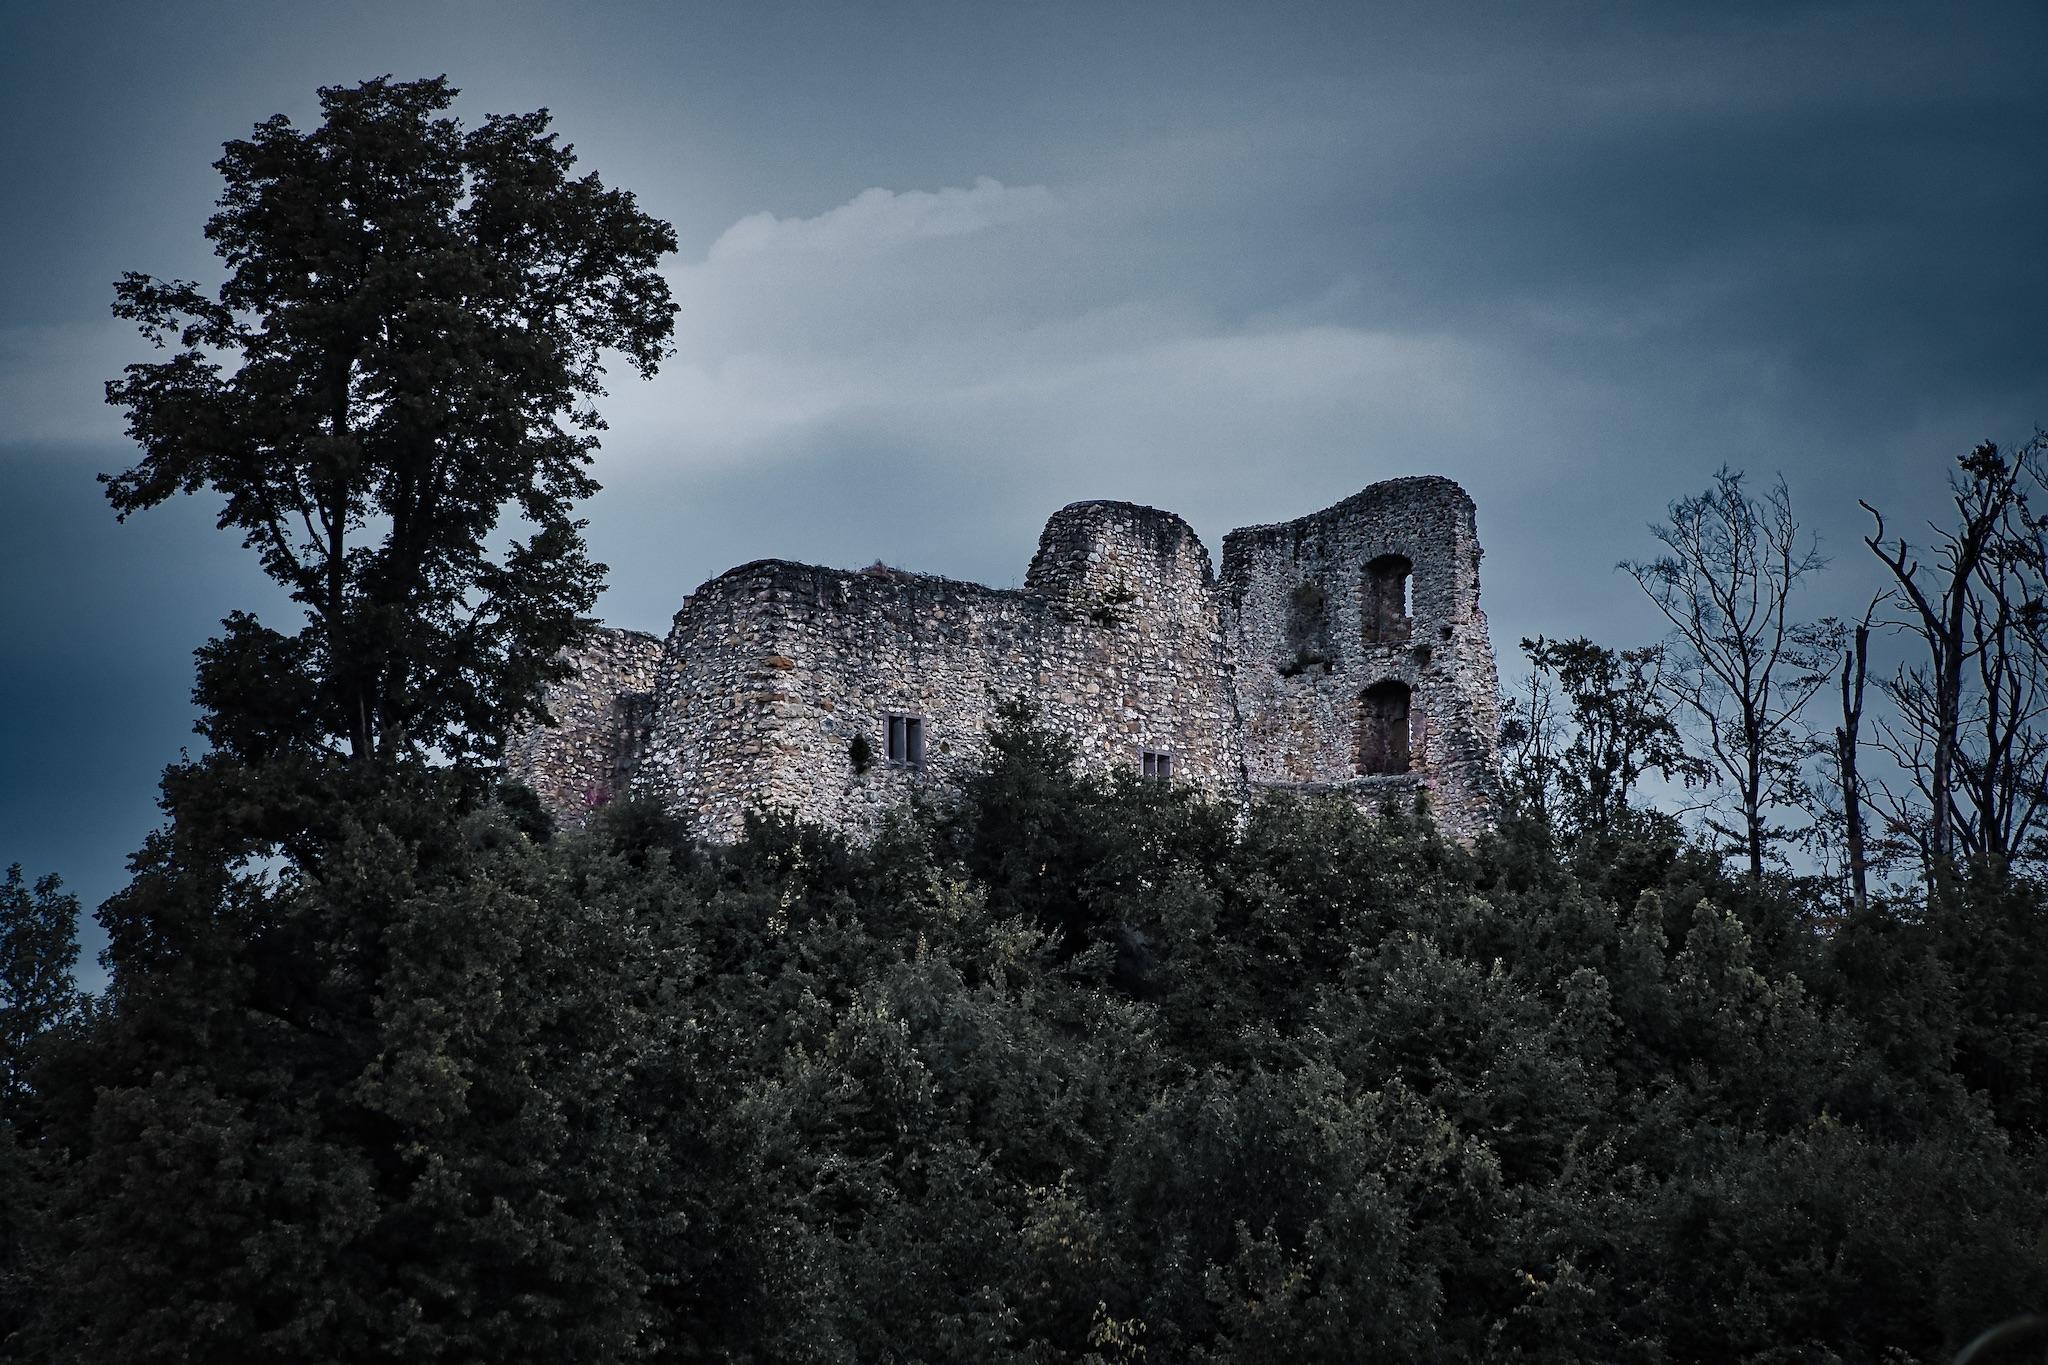 Ruine Schneeburg, Germany